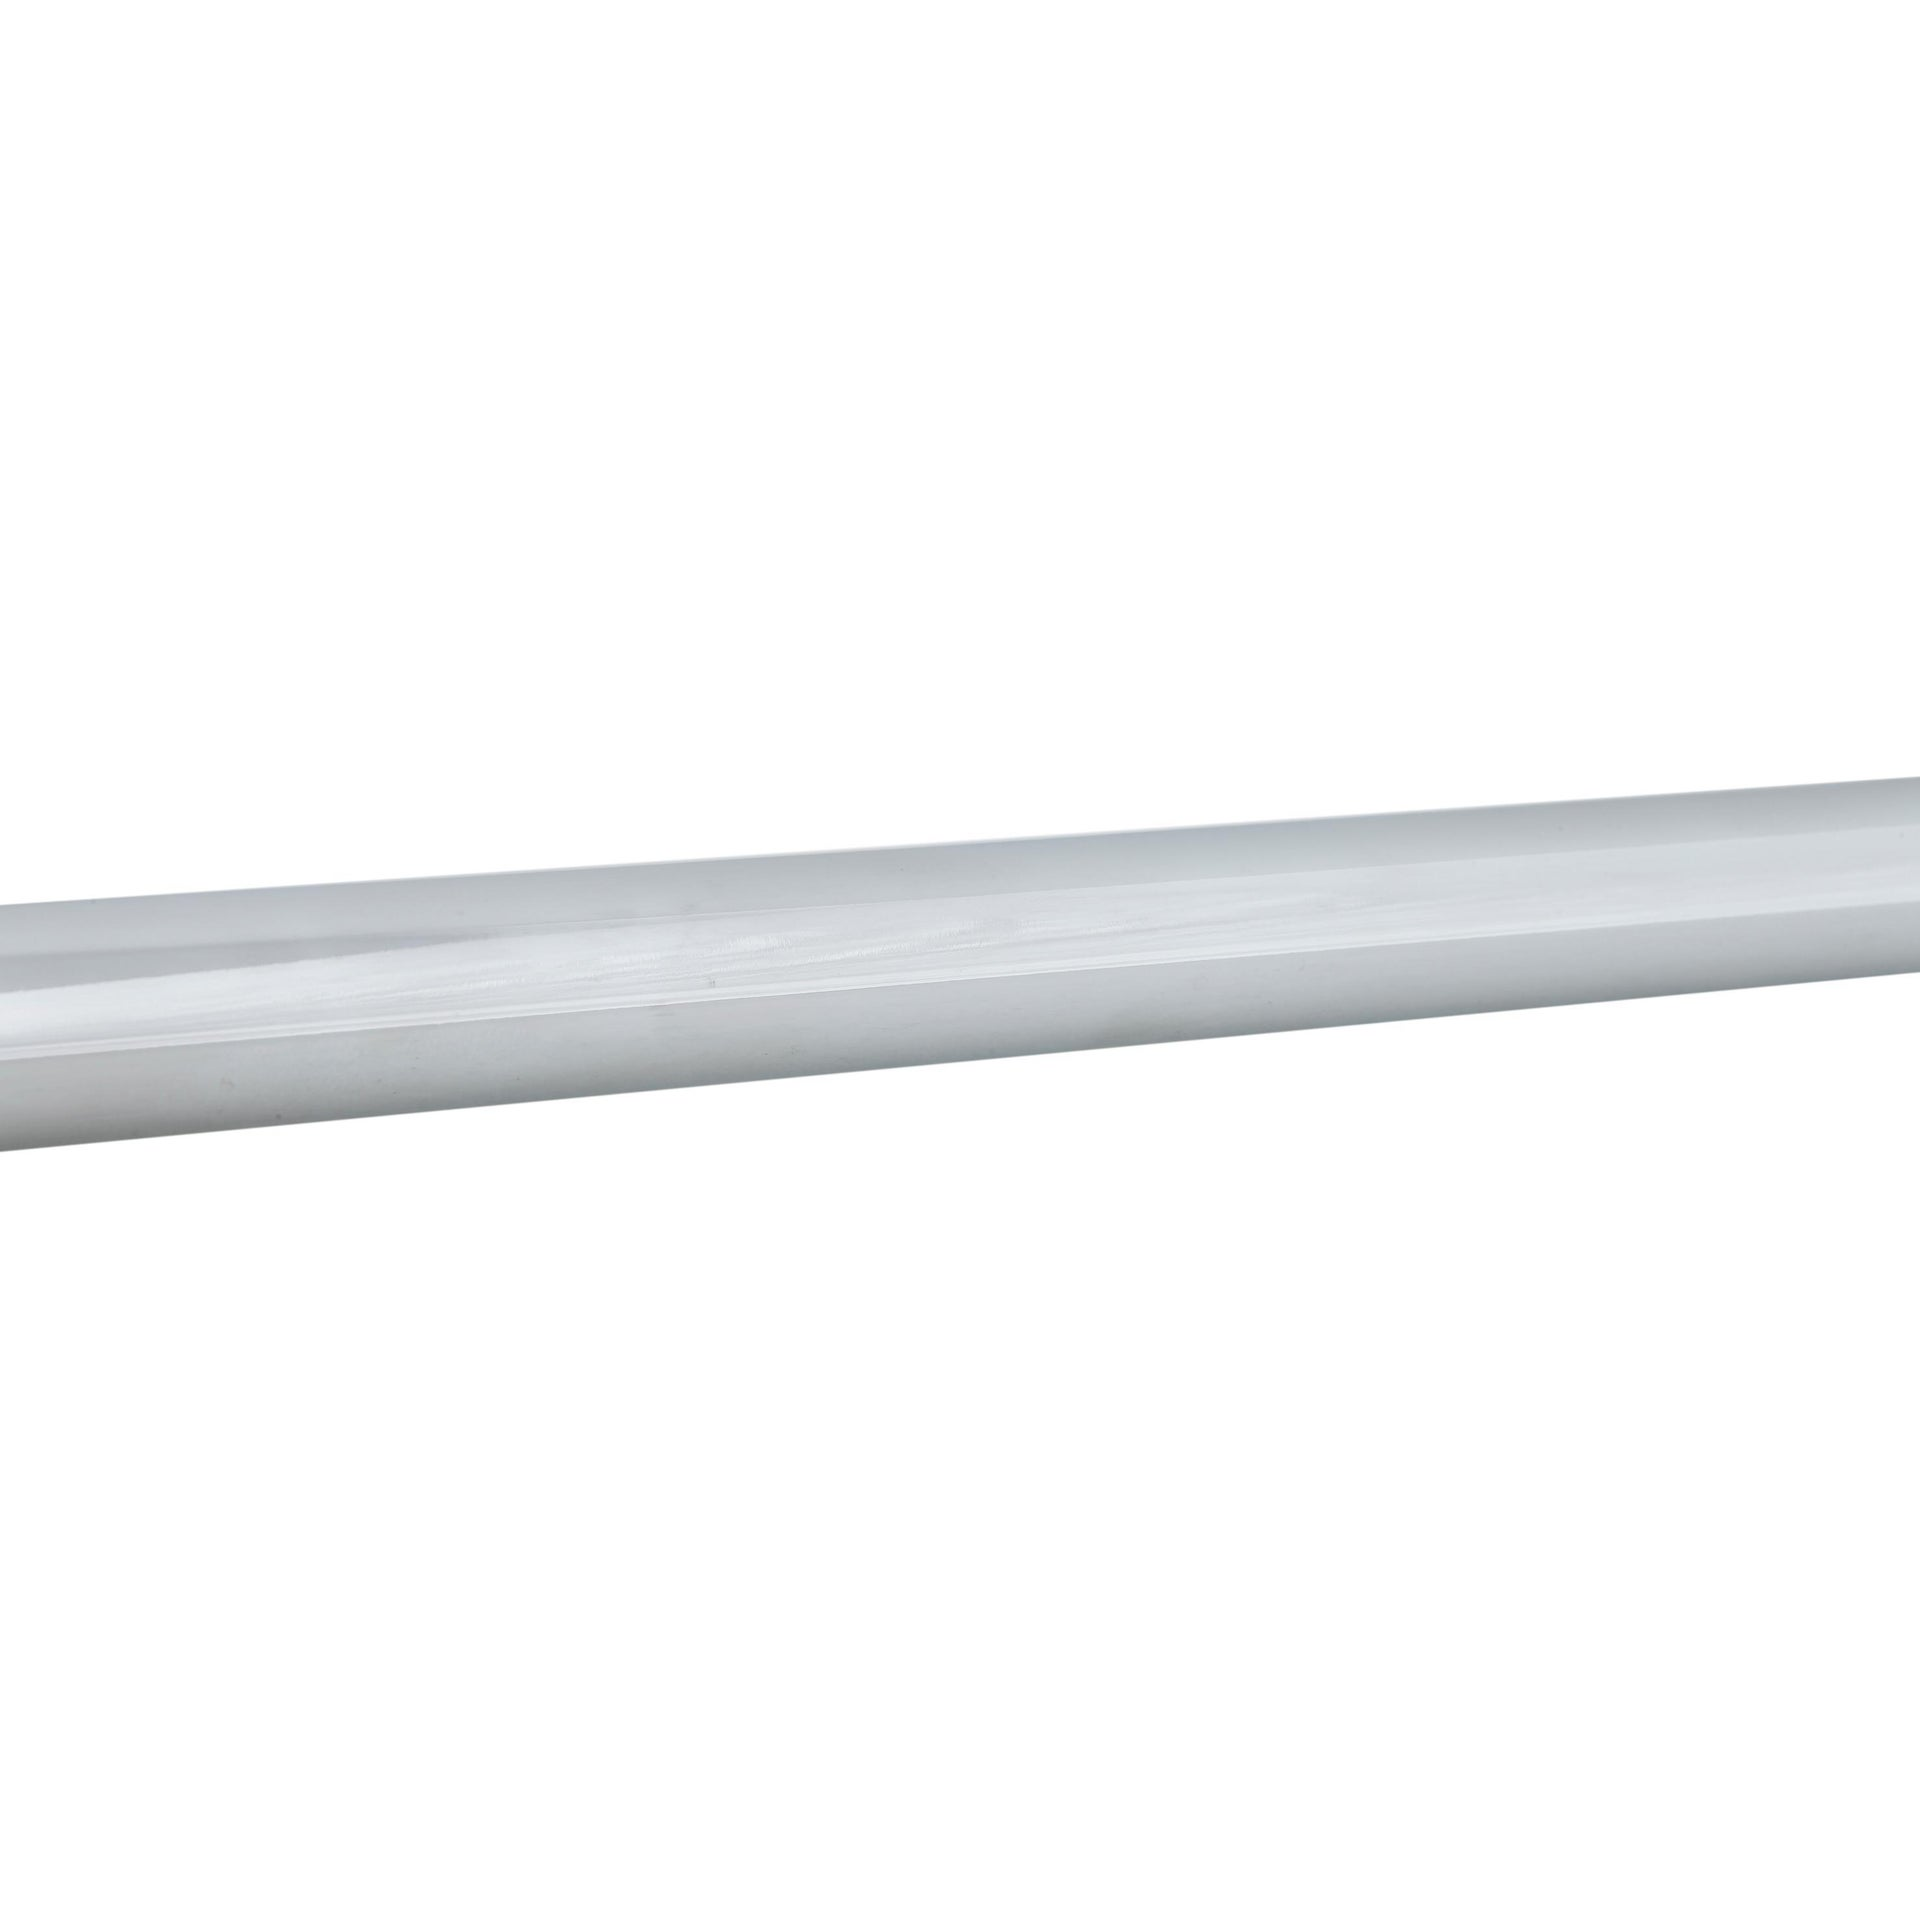 Barra portautensili DELINIA Equip Tout in acciaio 60 x 60 x 2.5 cm - 15